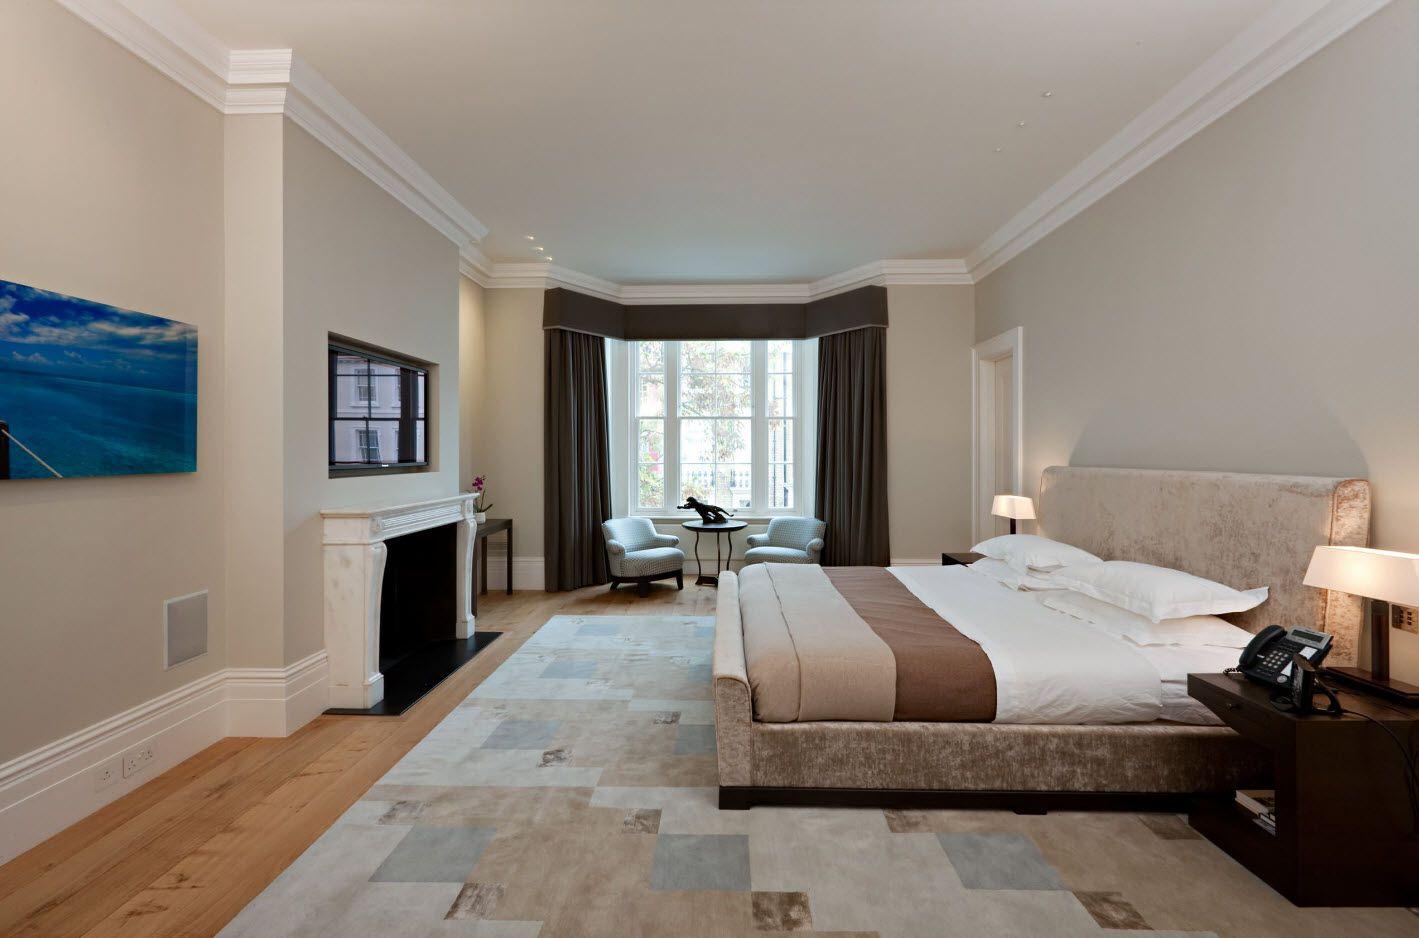 Bedroom window ideas   best ideas and novelties of design  bedroom ideas  pinterest